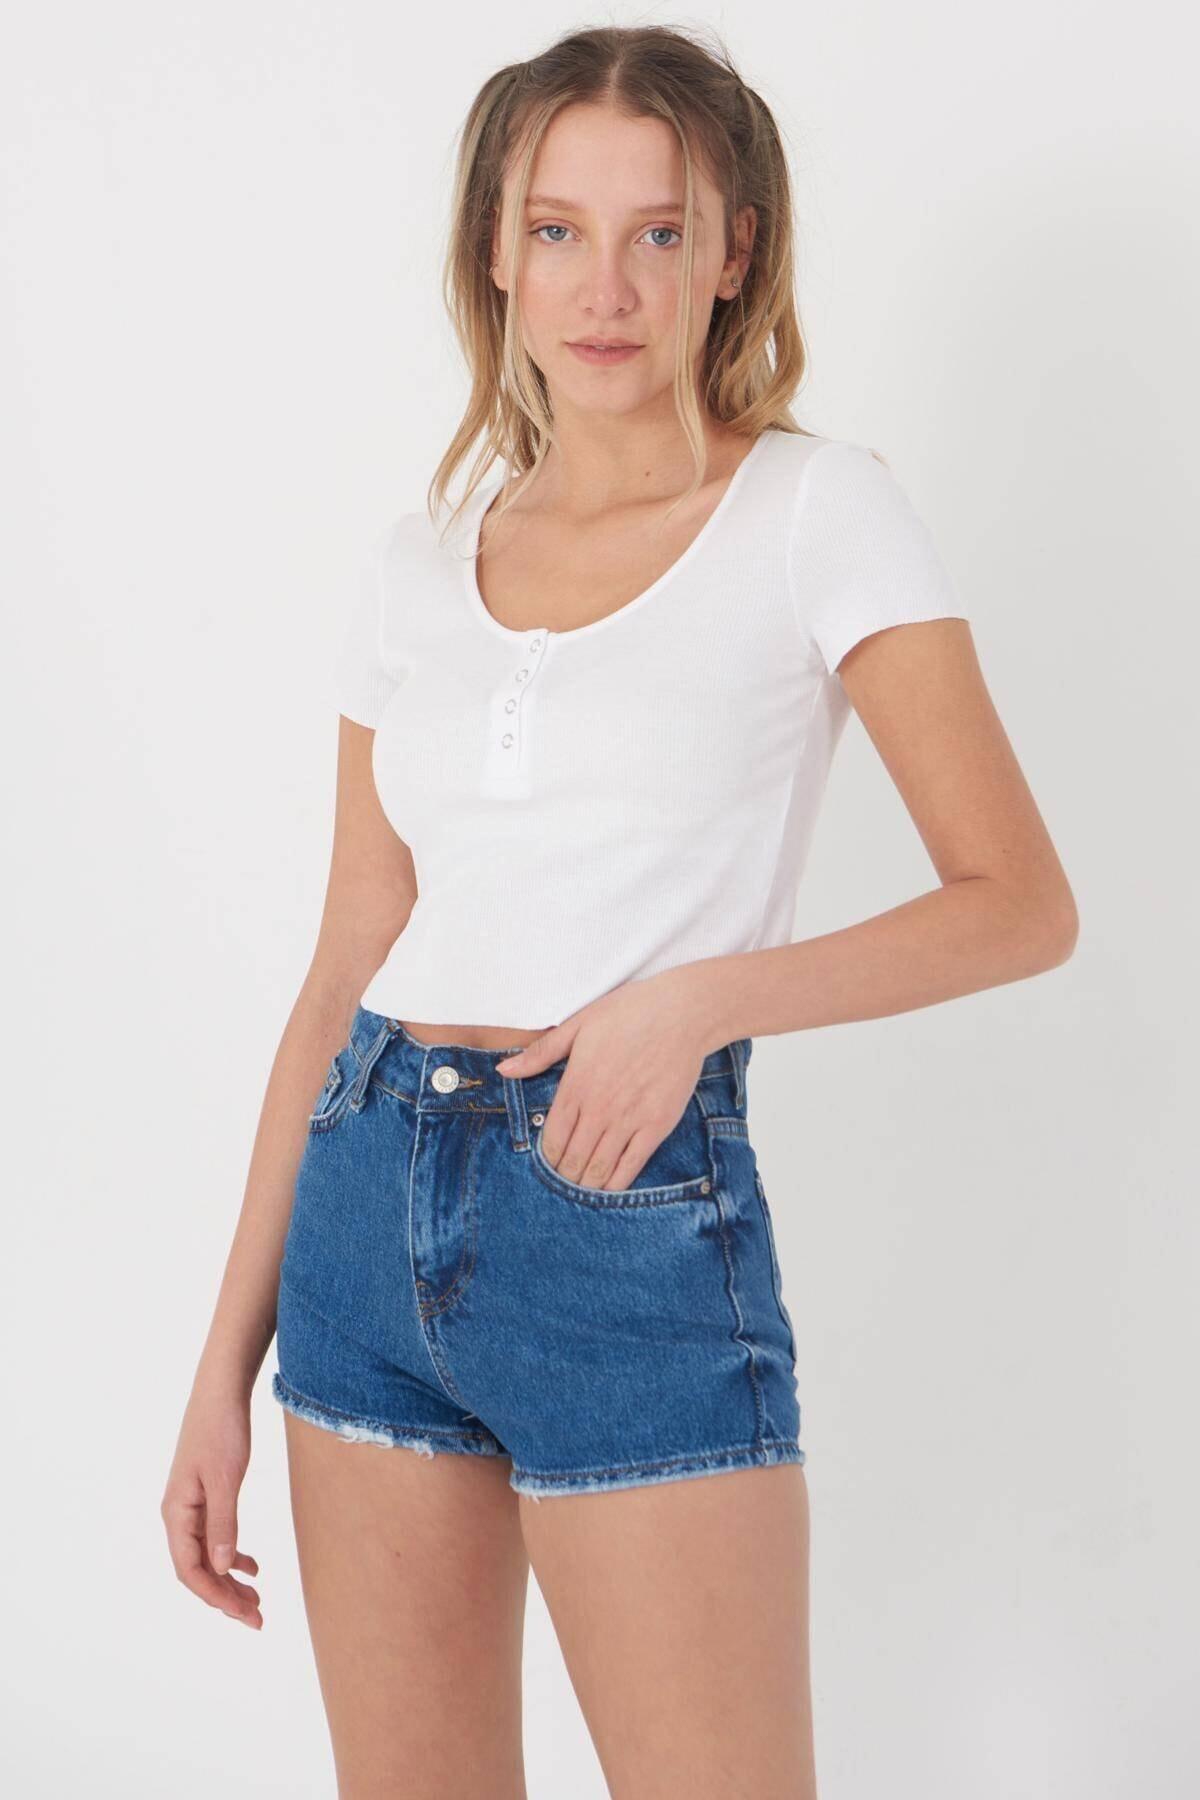 Addax Kadın Beyaz Çıtçıt Detaylı T-Shirt P0867 - Dk9 Adx-0000021736